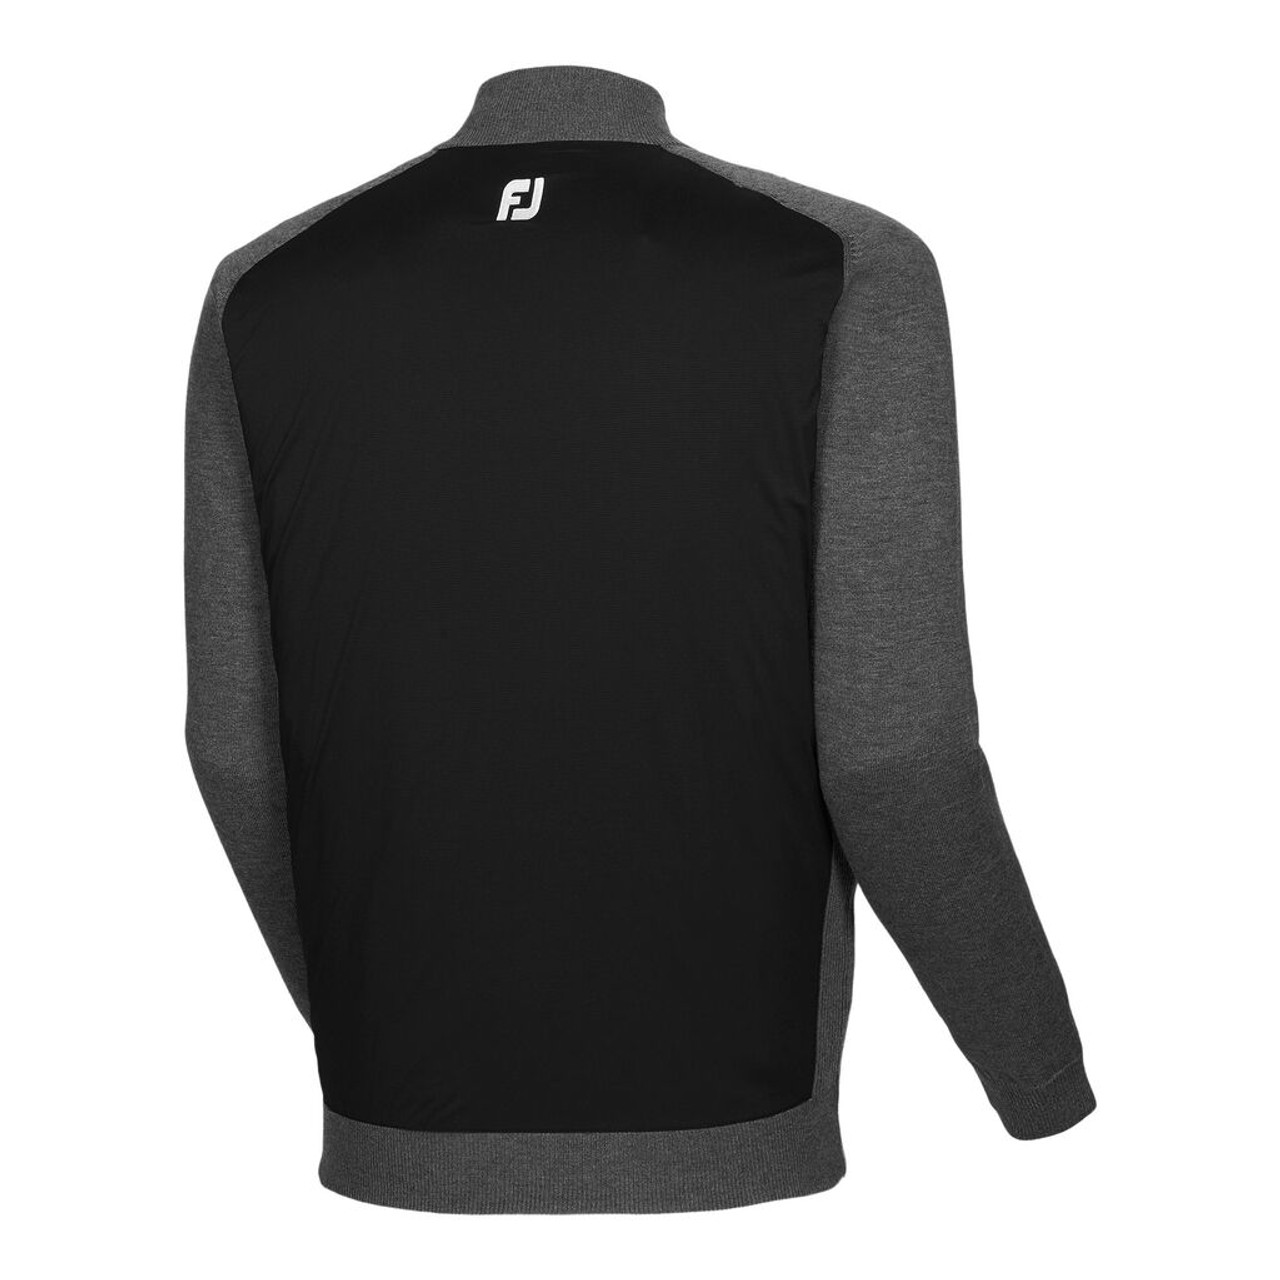 FootJoy Tech Sweater - Black / Heather Charcoal (25072)